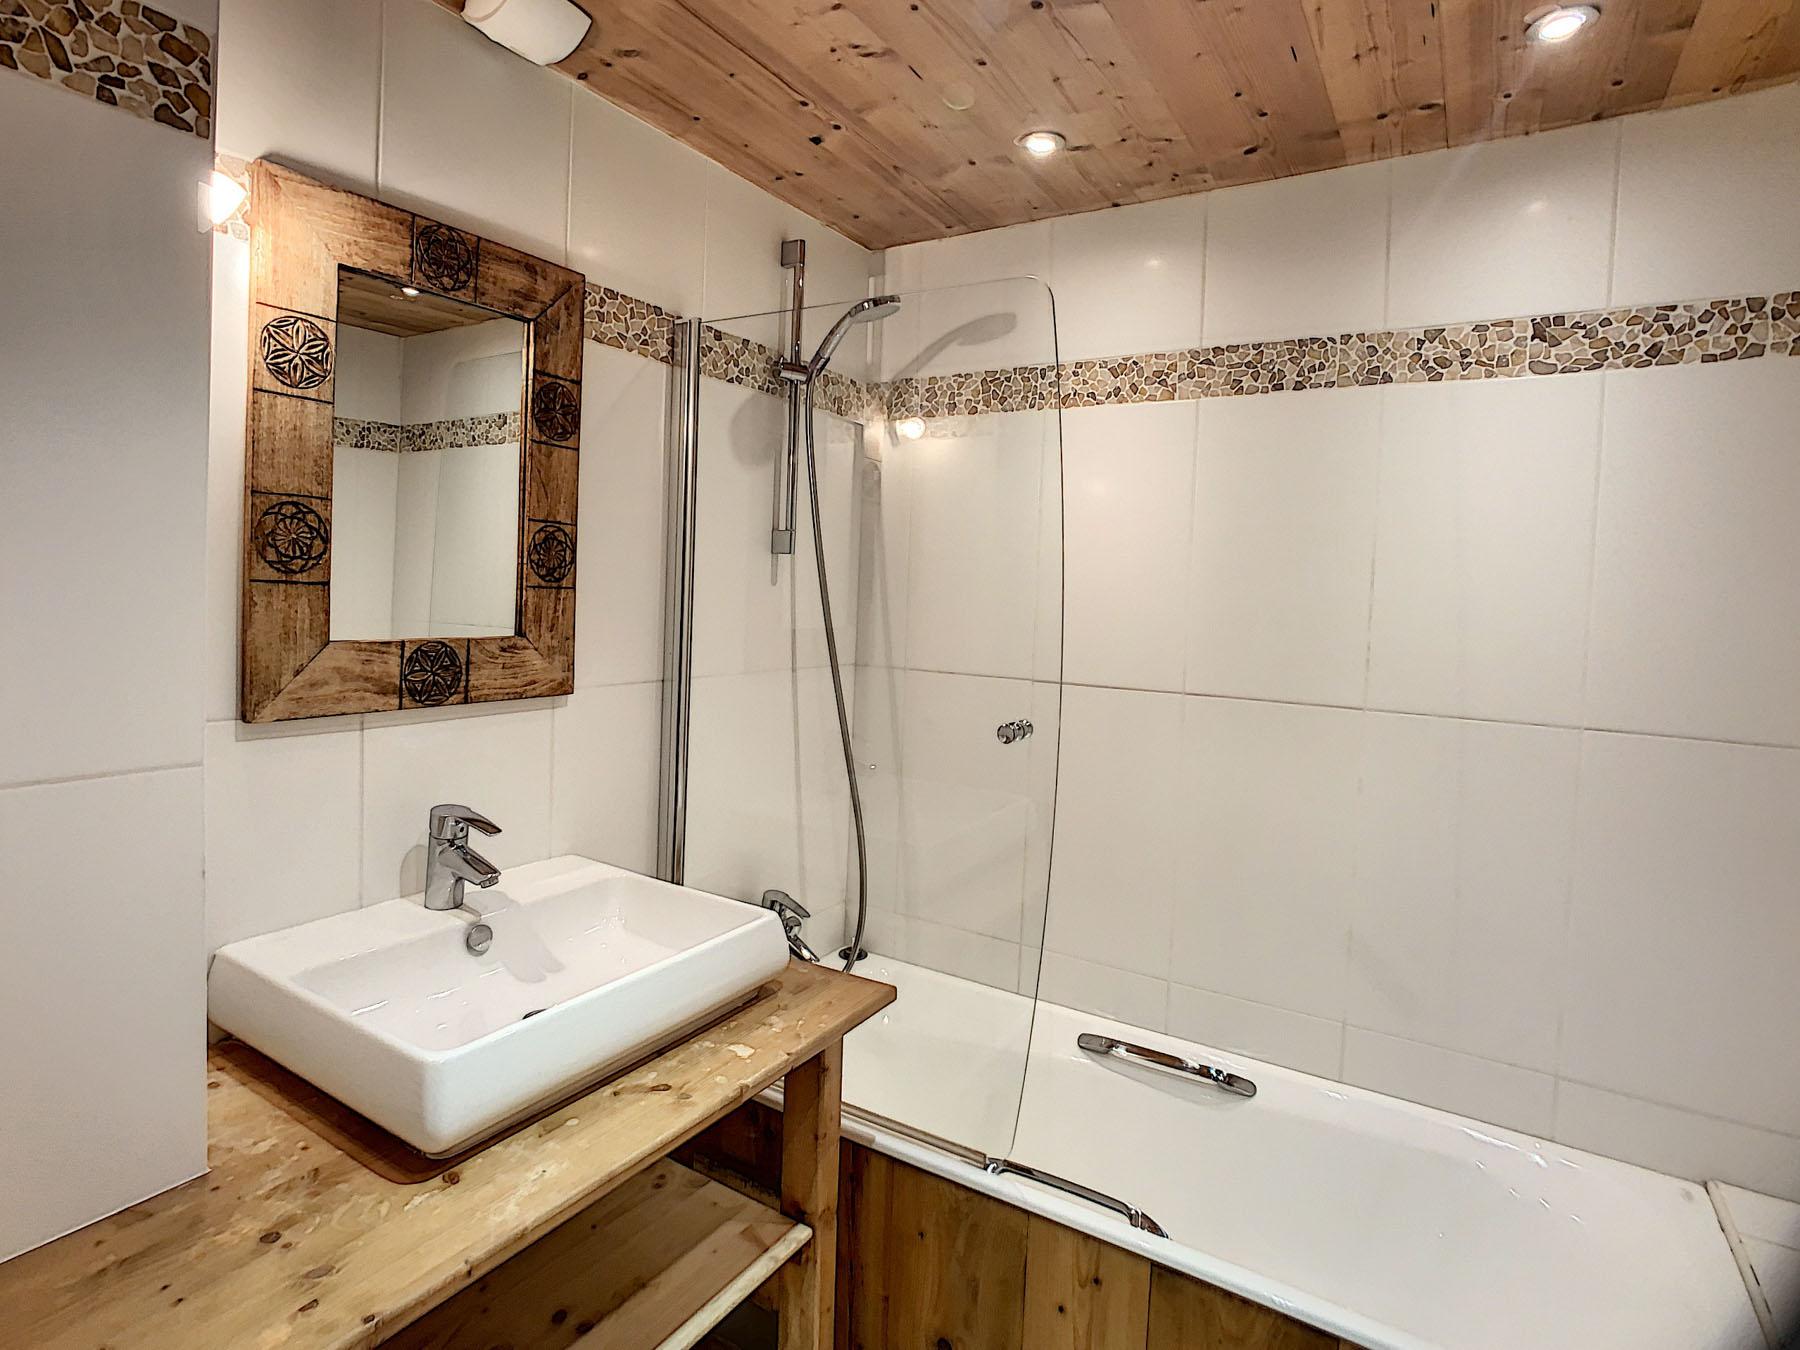 Mernaz 1160 Bathroom